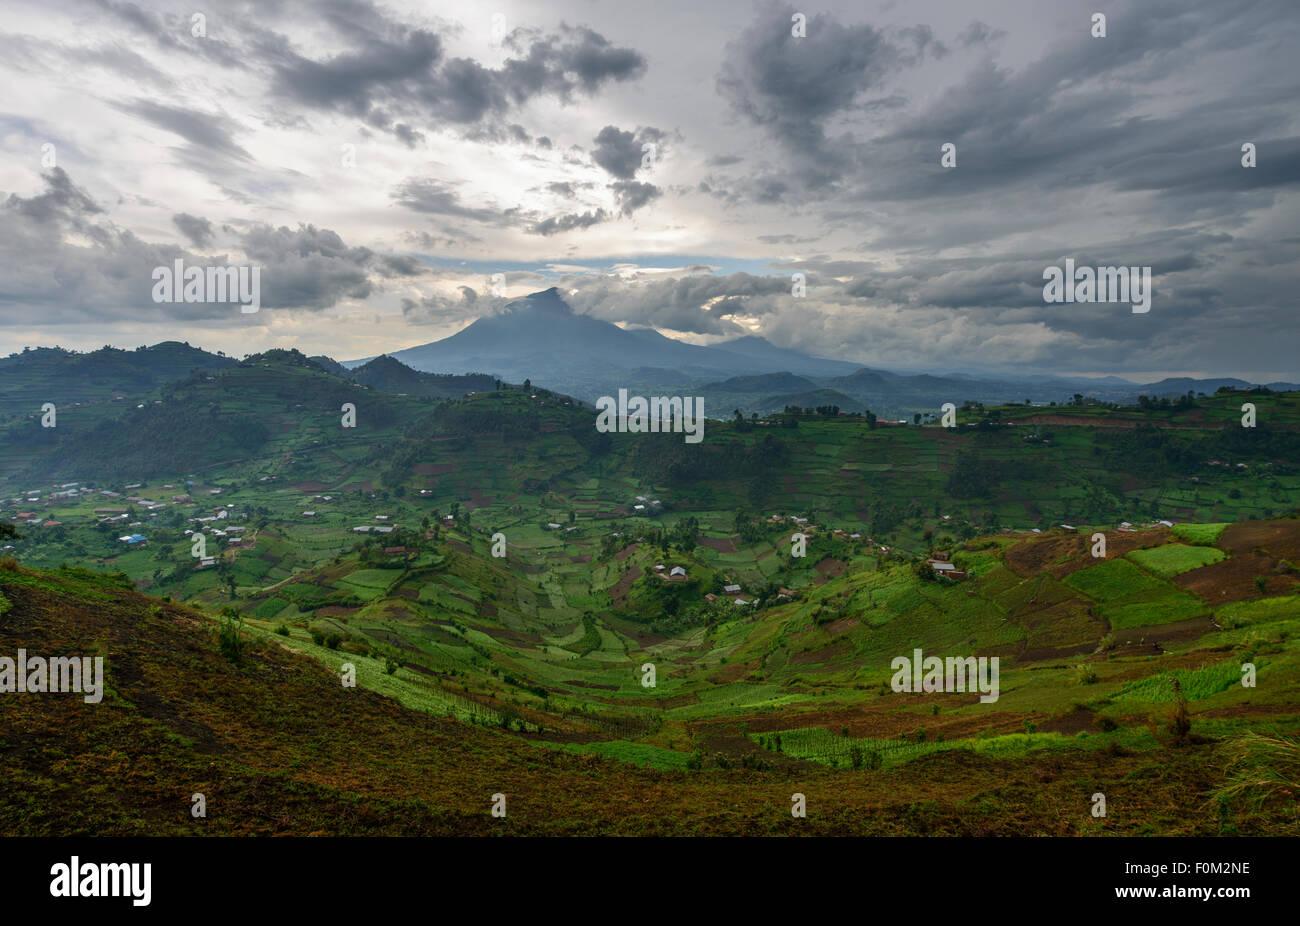 Las montañas Virunga, Uganda, África Imagen De Stock